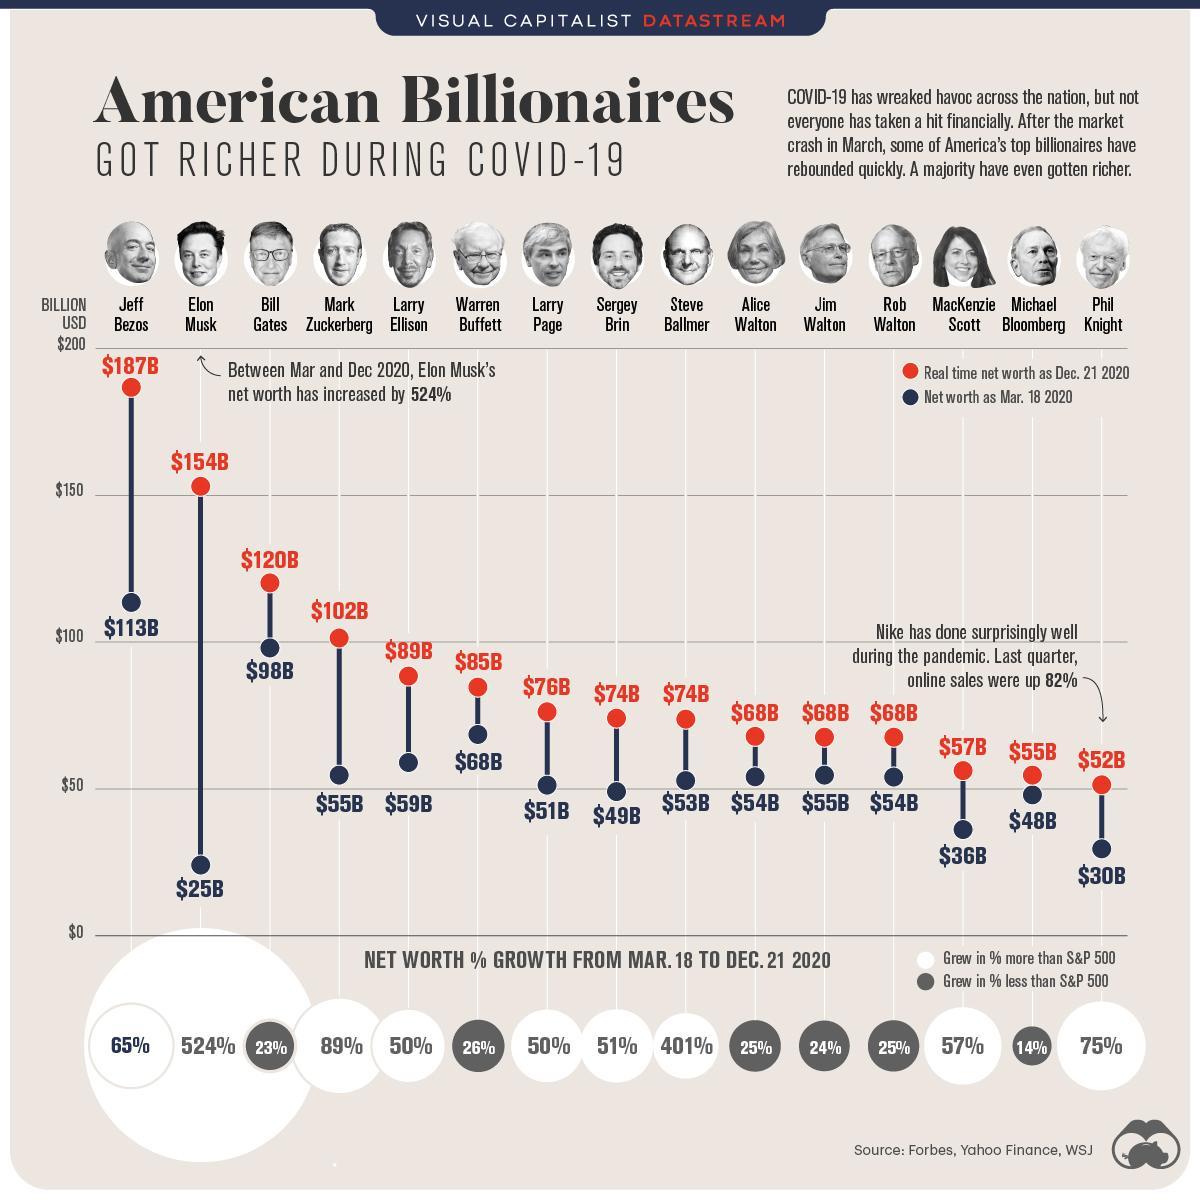 https://cms.zerohedge.com/s3/files/inline-images/American_Billionaires_Post-1-1.jpg?itok=HJdHX9Ix